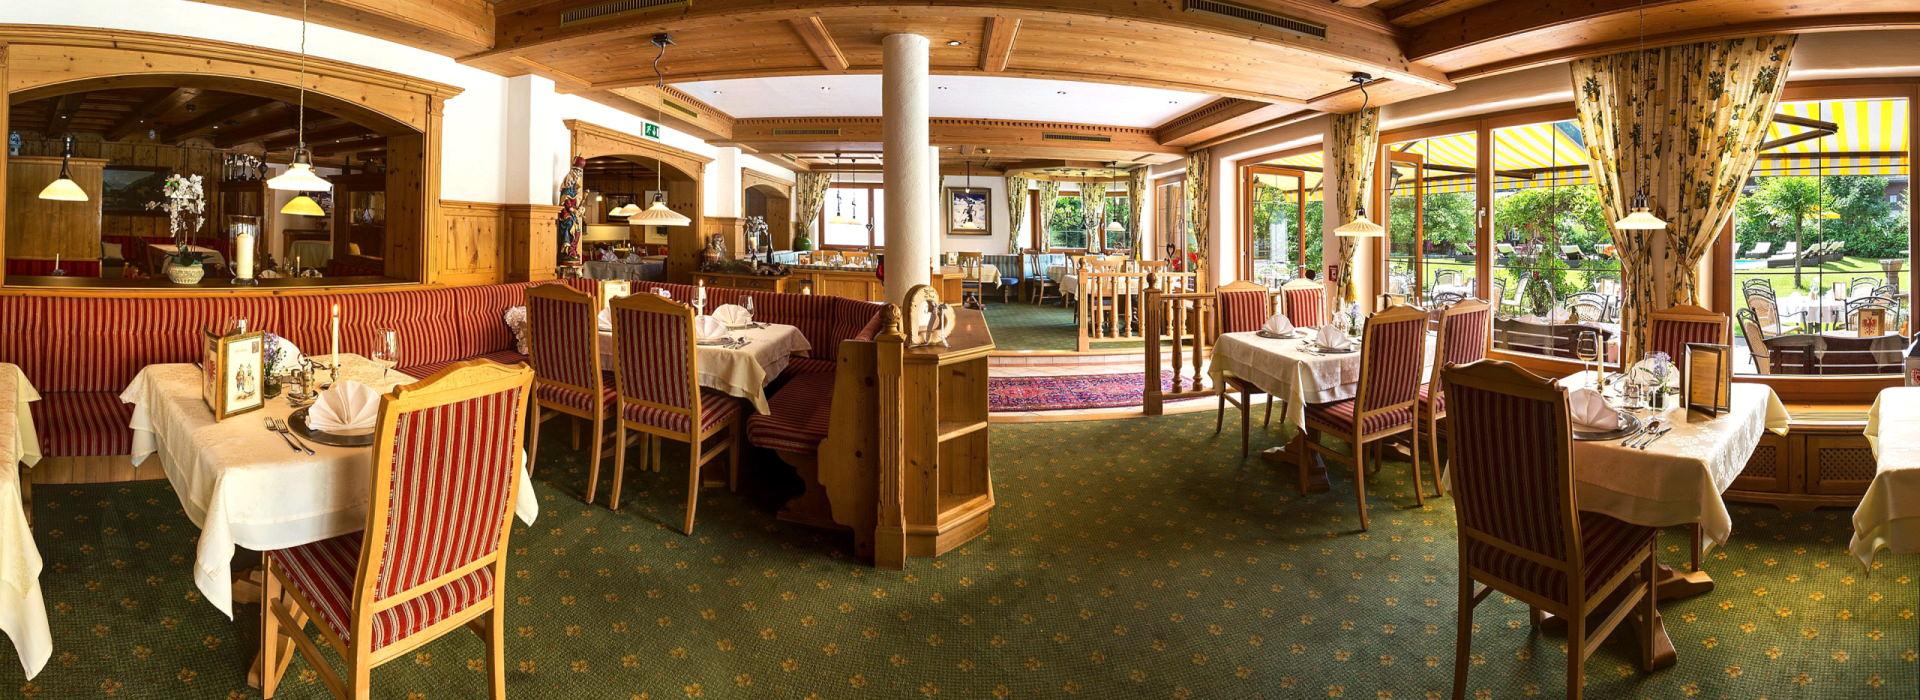 Our dining room in the Alpenhotel Tirolerhof**** Neustift